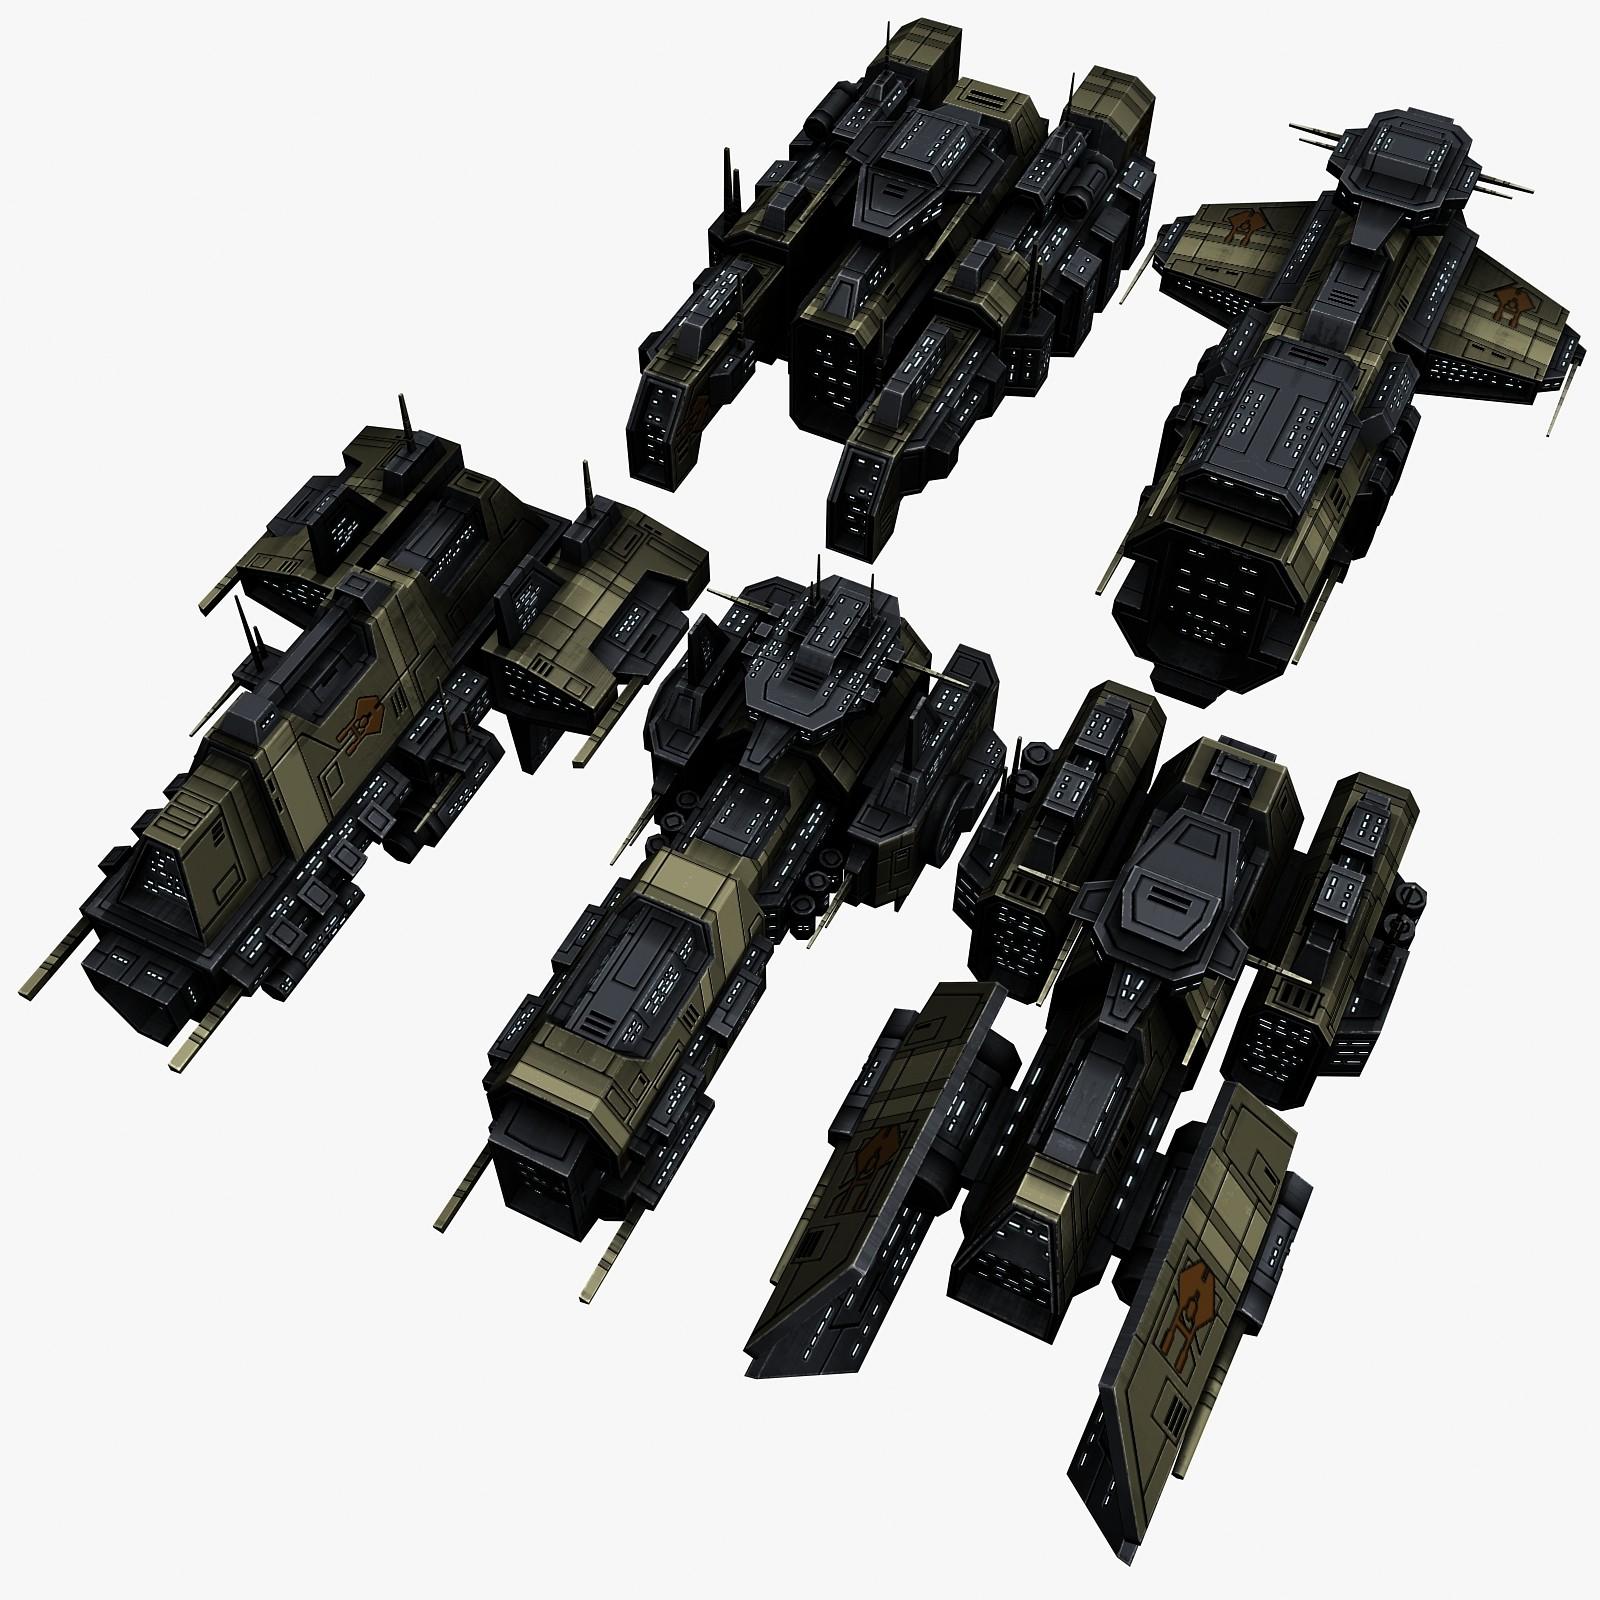 5_civilian_transport_spaceships_preview.jpg